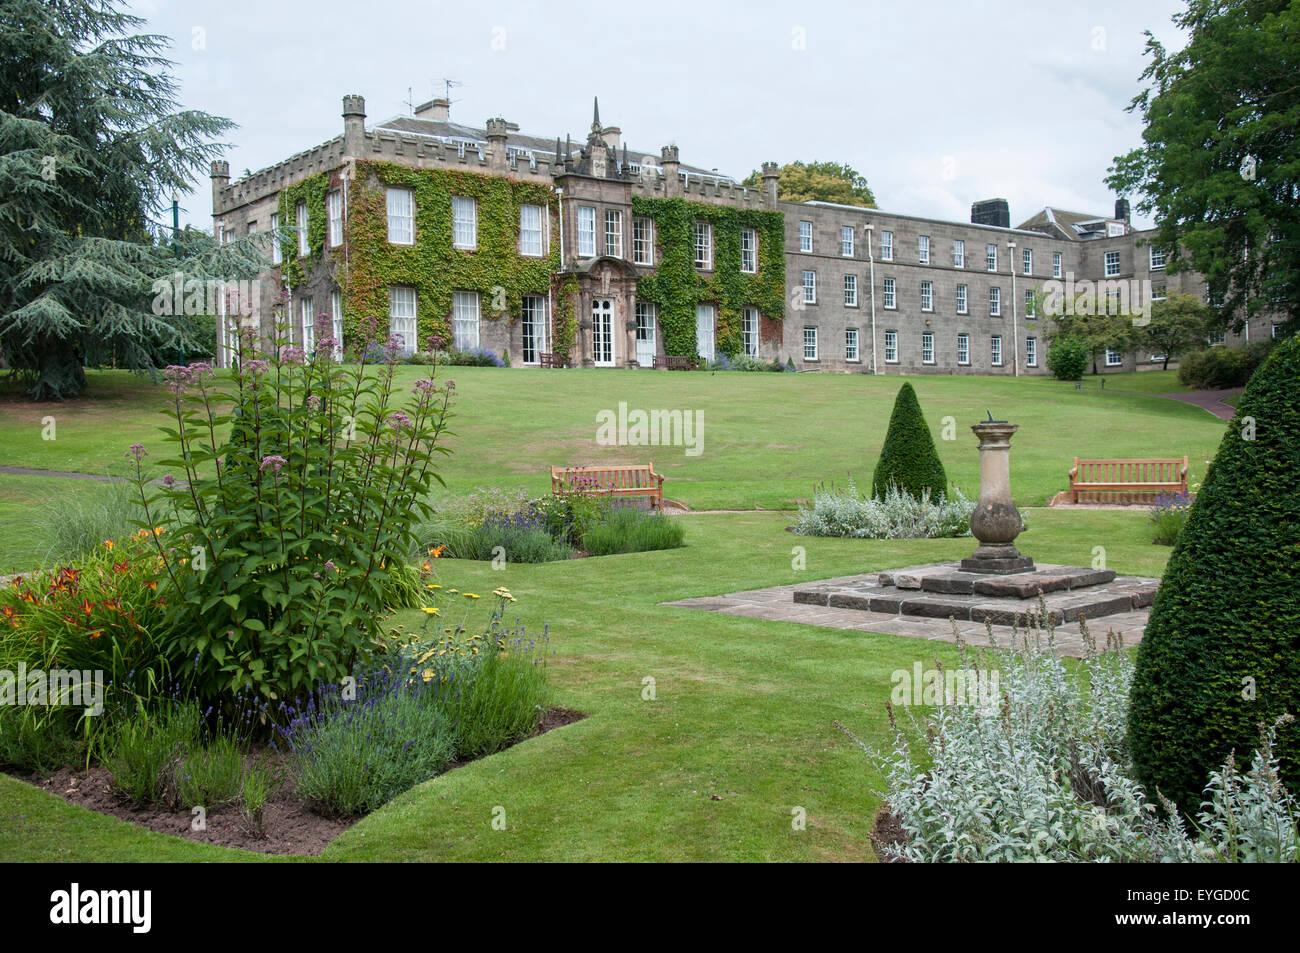 Hugh Stewart Hall And Gardens On The Nottingham University Campus,  Nottinghamshire England UK